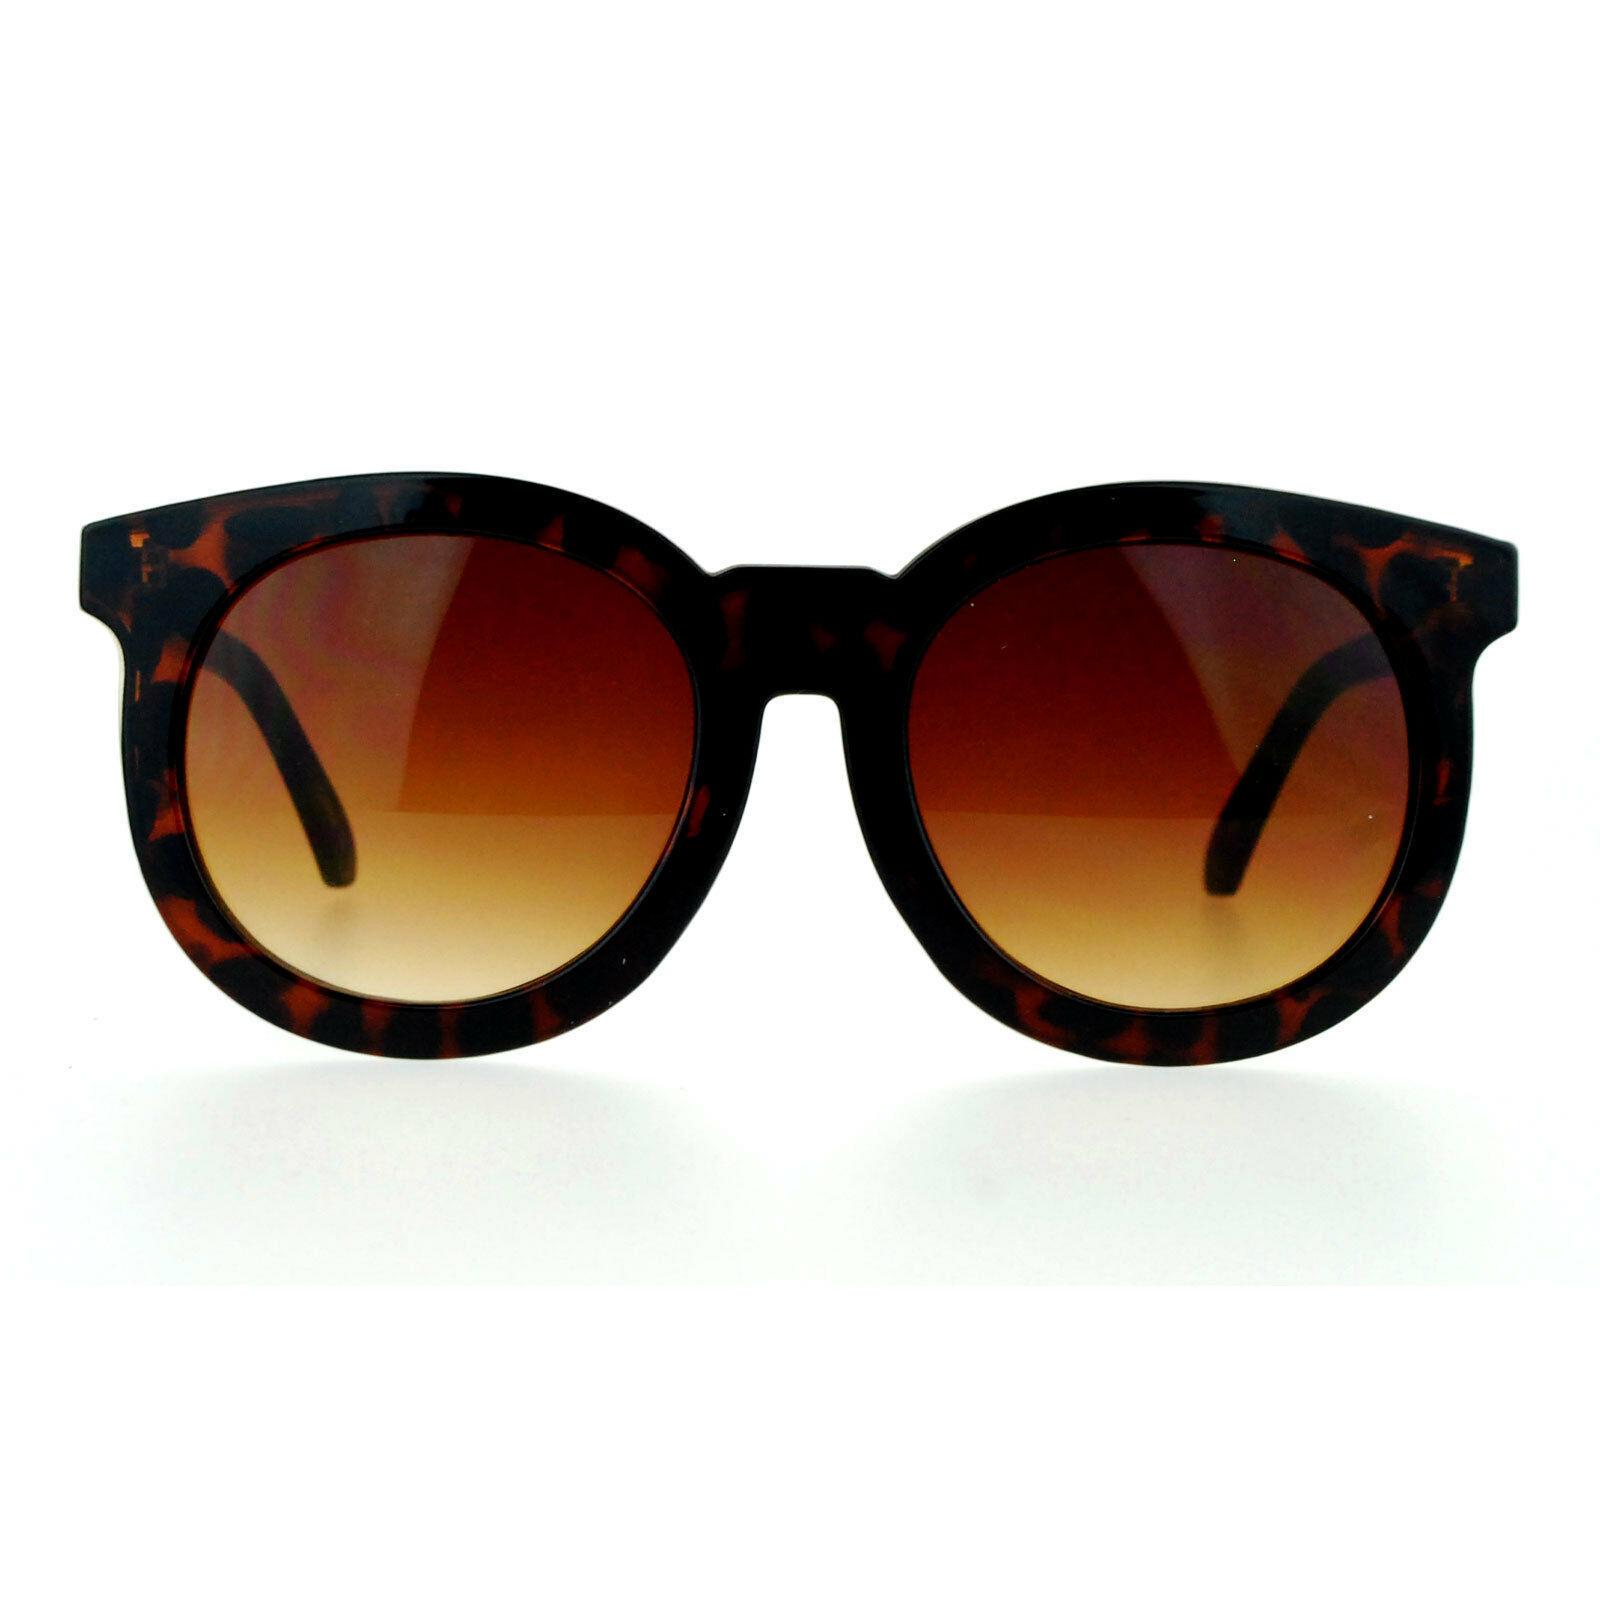 Womens Fashion Sunglasses Oversized Round Horn Rim Arrow Design